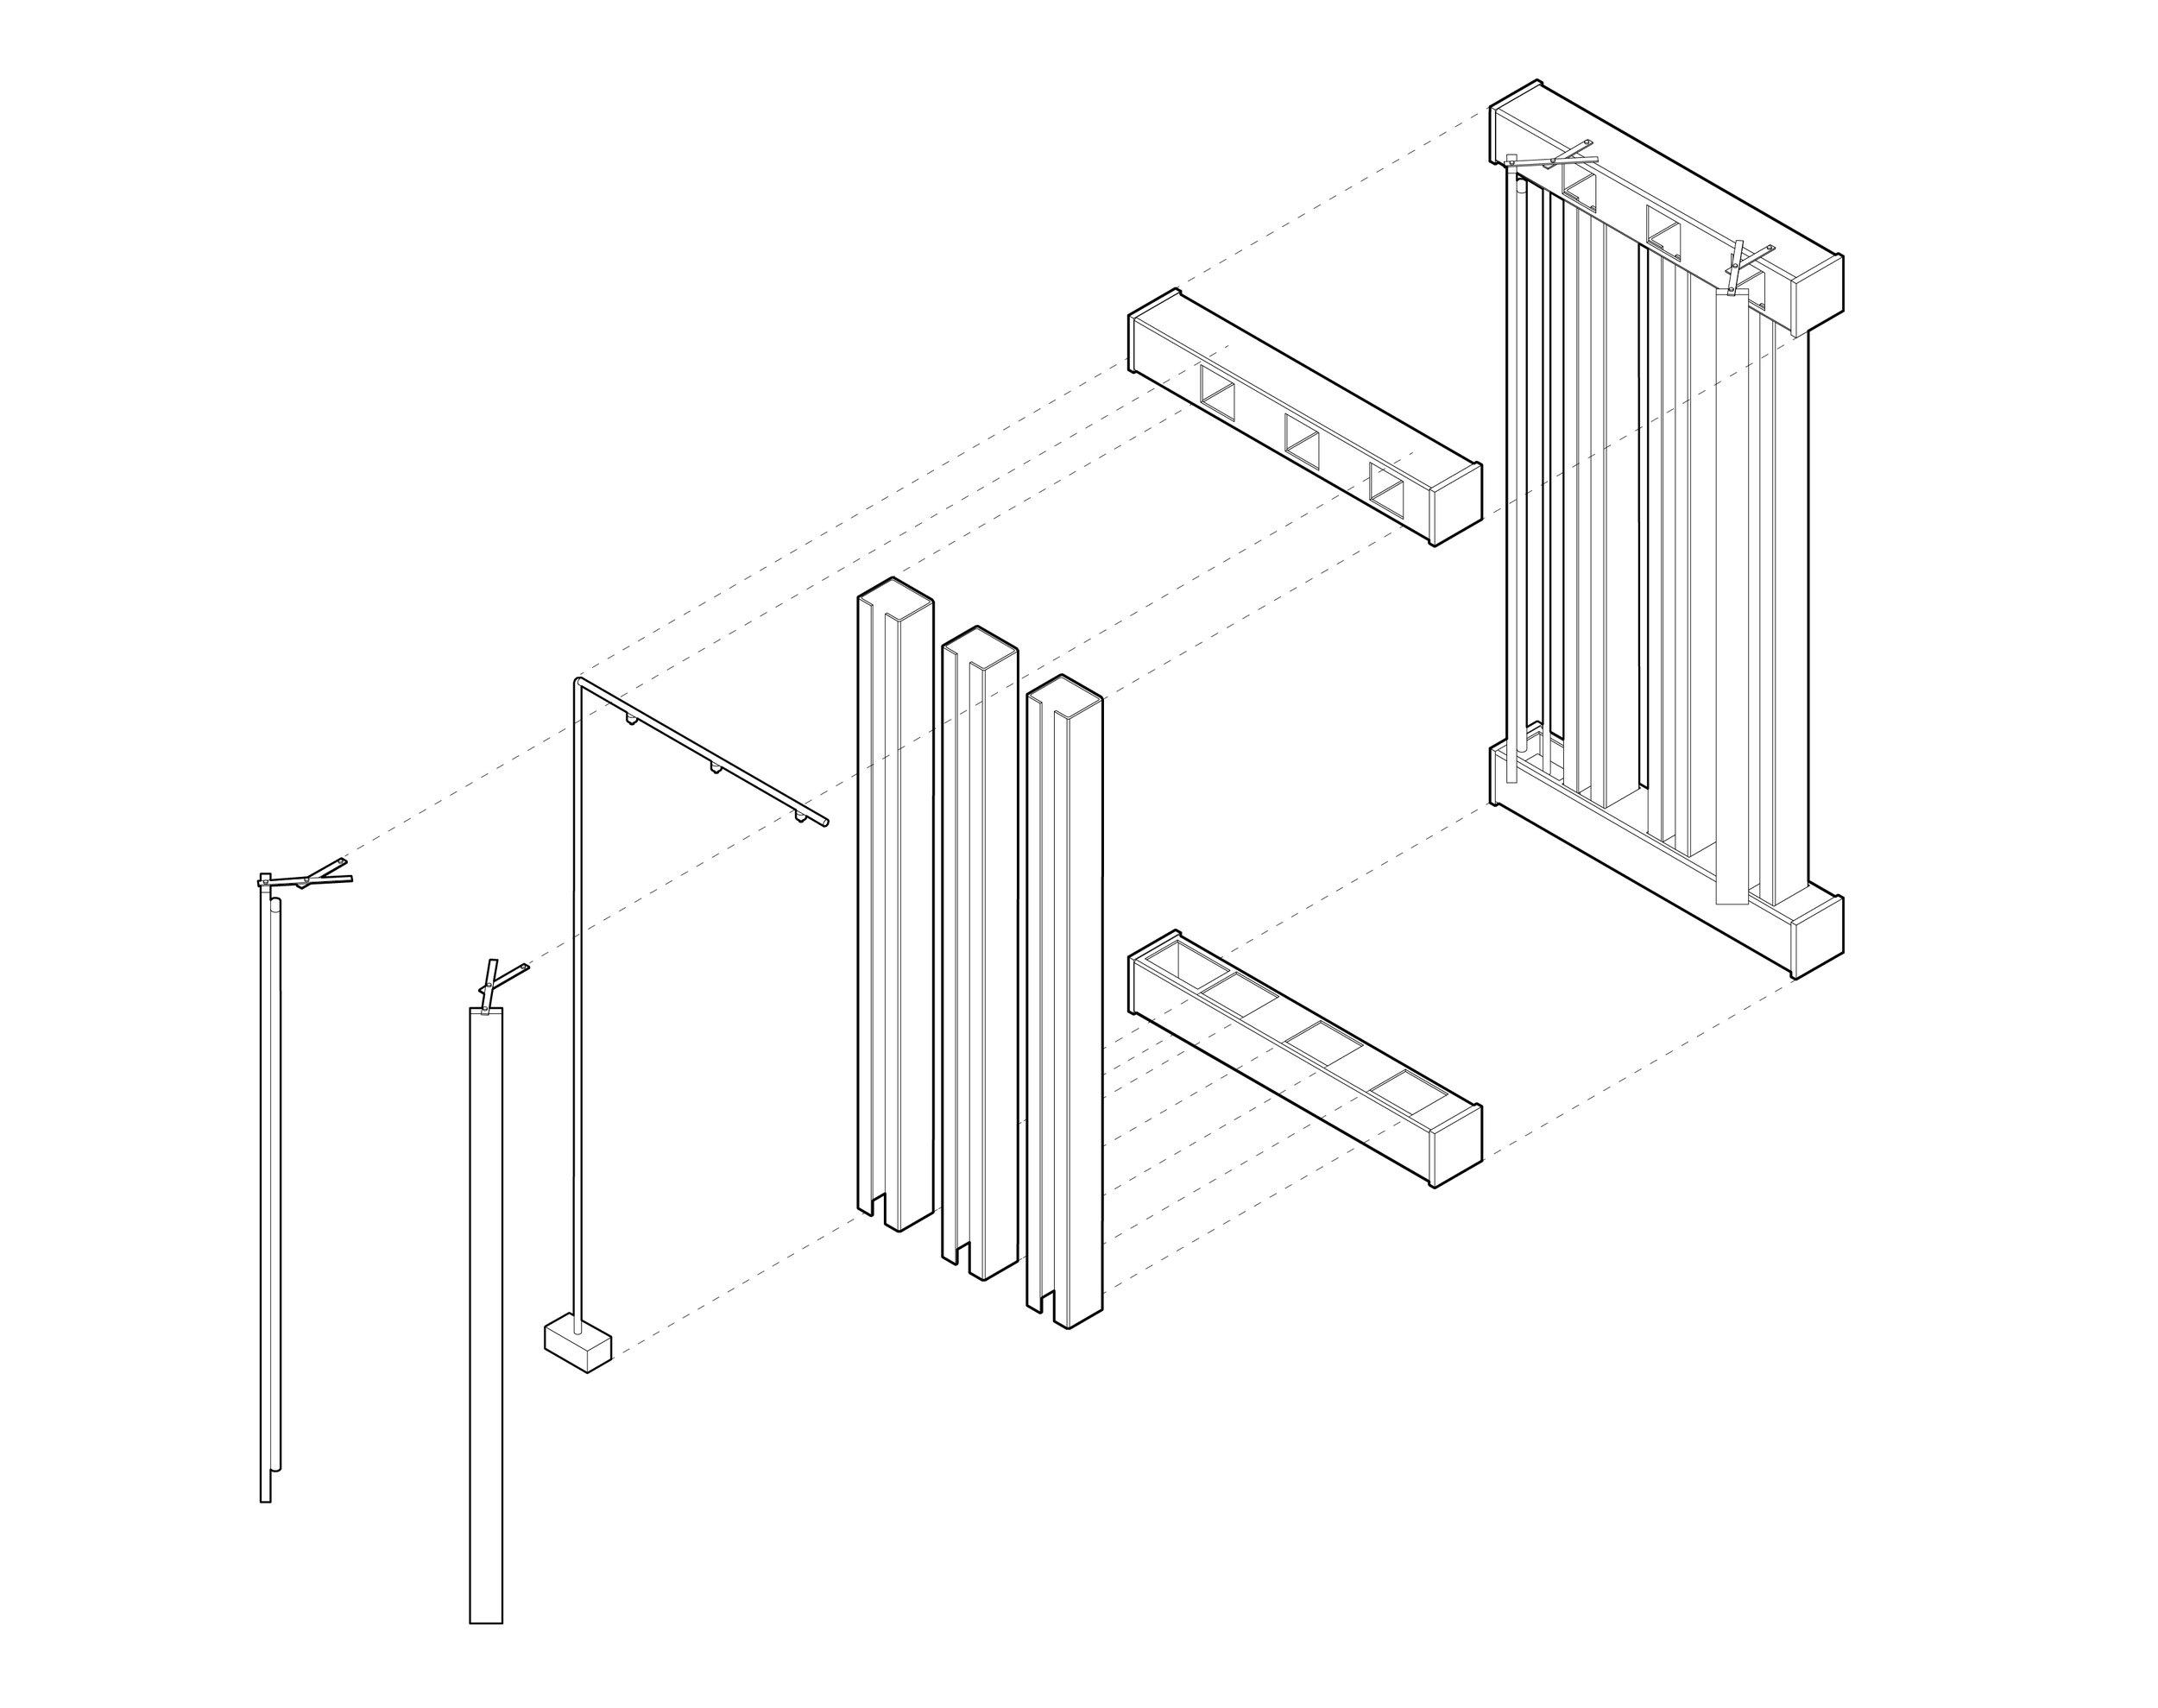 hydroponics drip axo [Converted]-01.jpg